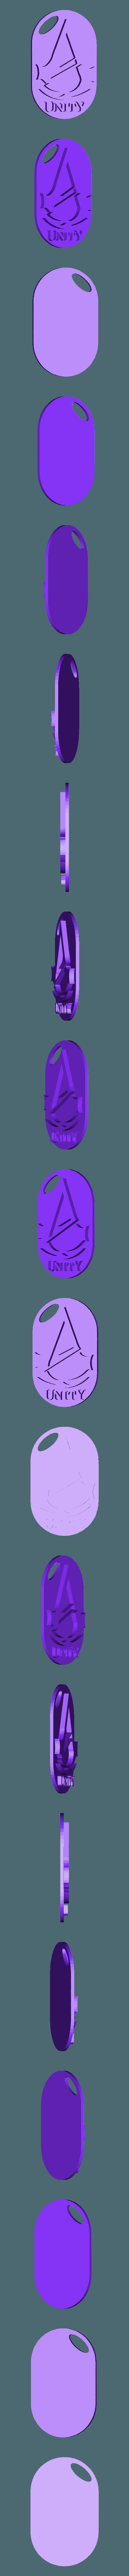 unity_16.STL Download free STL file Assassins Creed Unity (2014) • 3D printable design, arifsethi